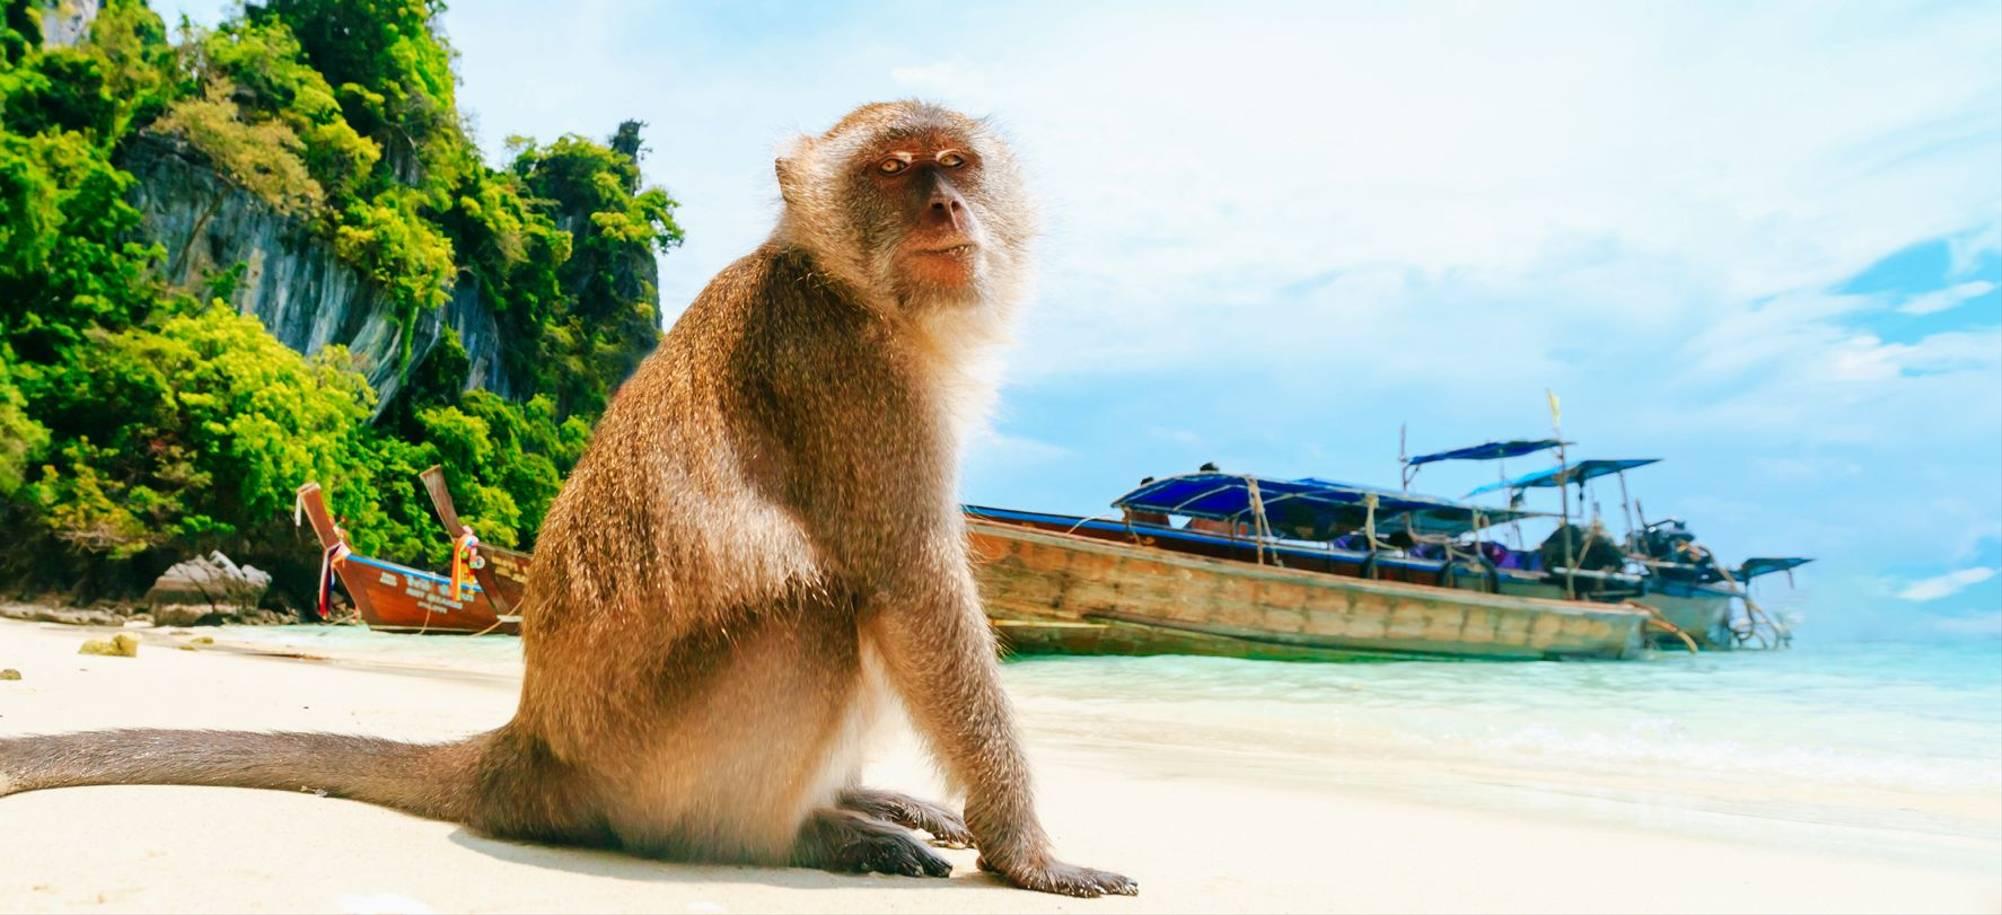 Phi Phi - Monkey beach - Itinerary Desktop .jpg